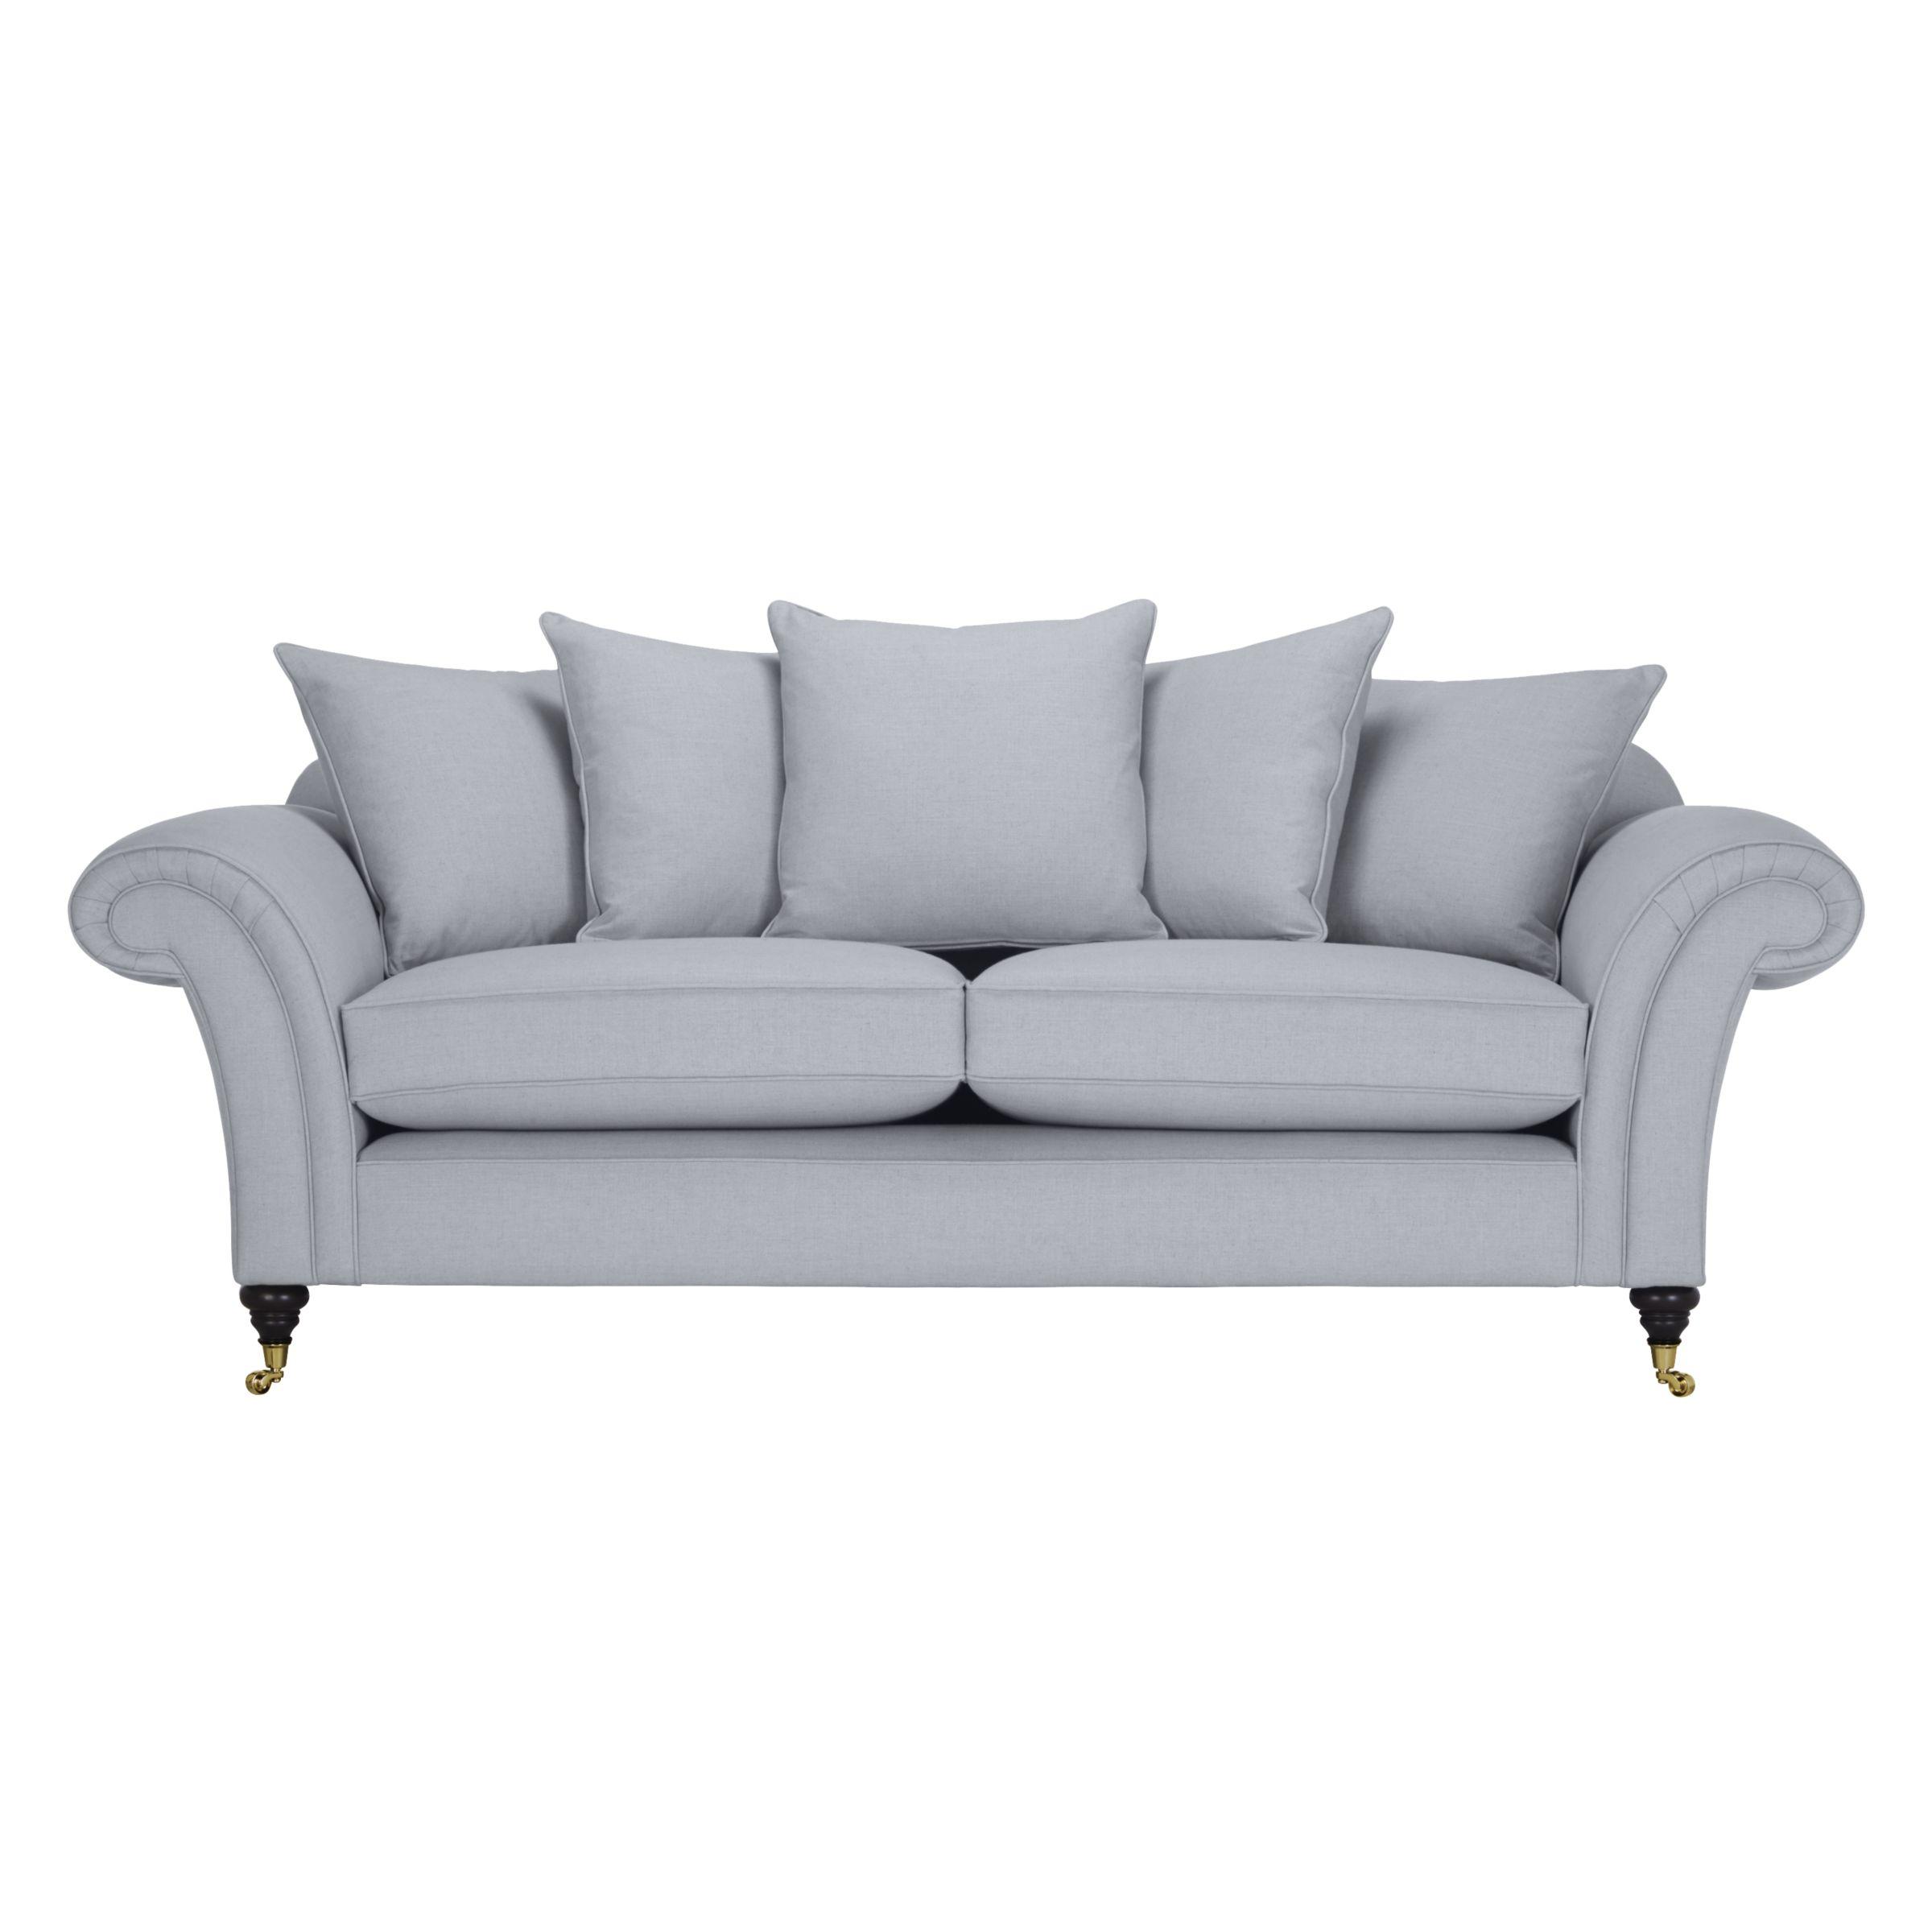 Buy sofas online reviews Homework Service